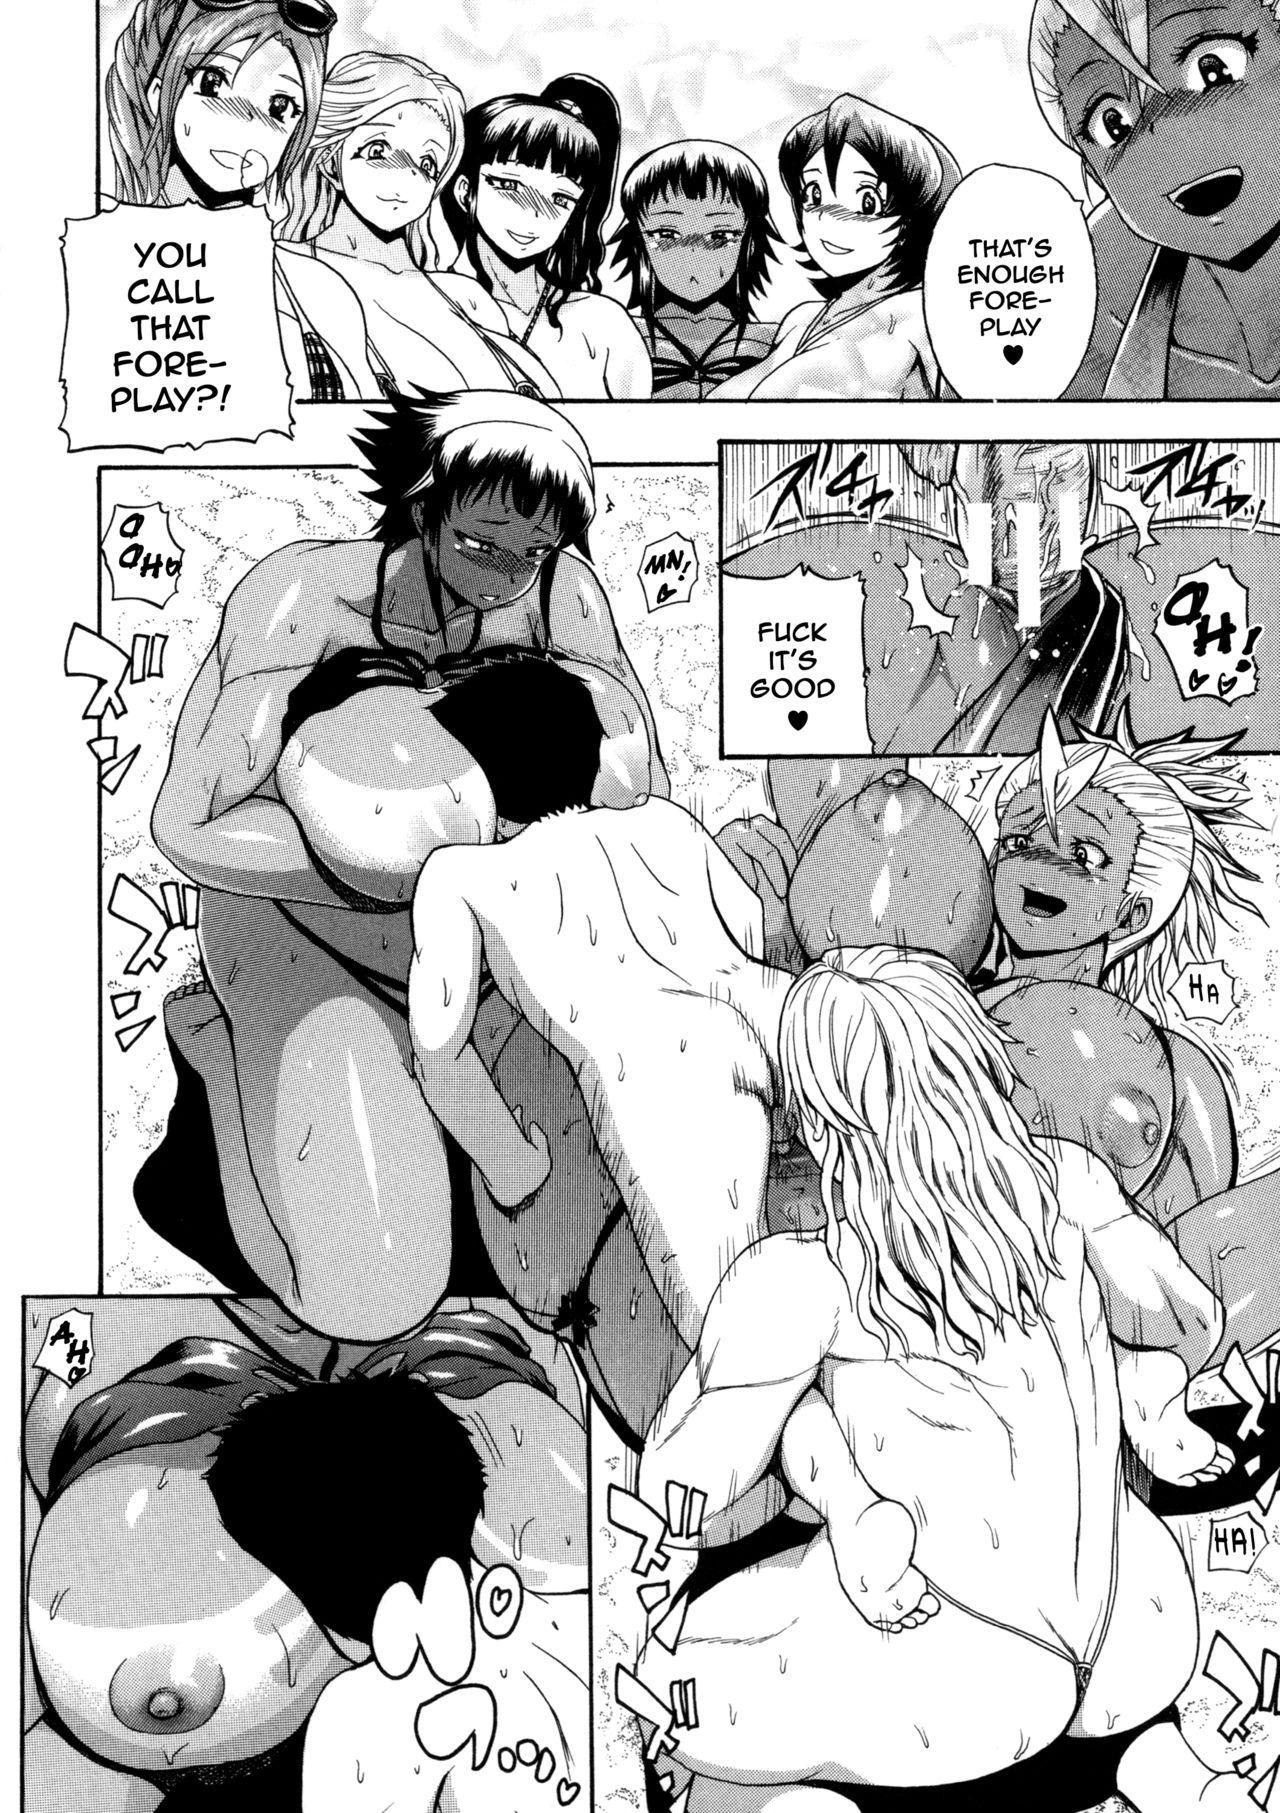 [Yoshimura Tatsumaki] Monzetsu Taigatame ~Count 3 de Ikasete Ageru~ | Faint in Agony Bodylock ~I'll make you cum on the count of 3~ [English] [Brolen] 207